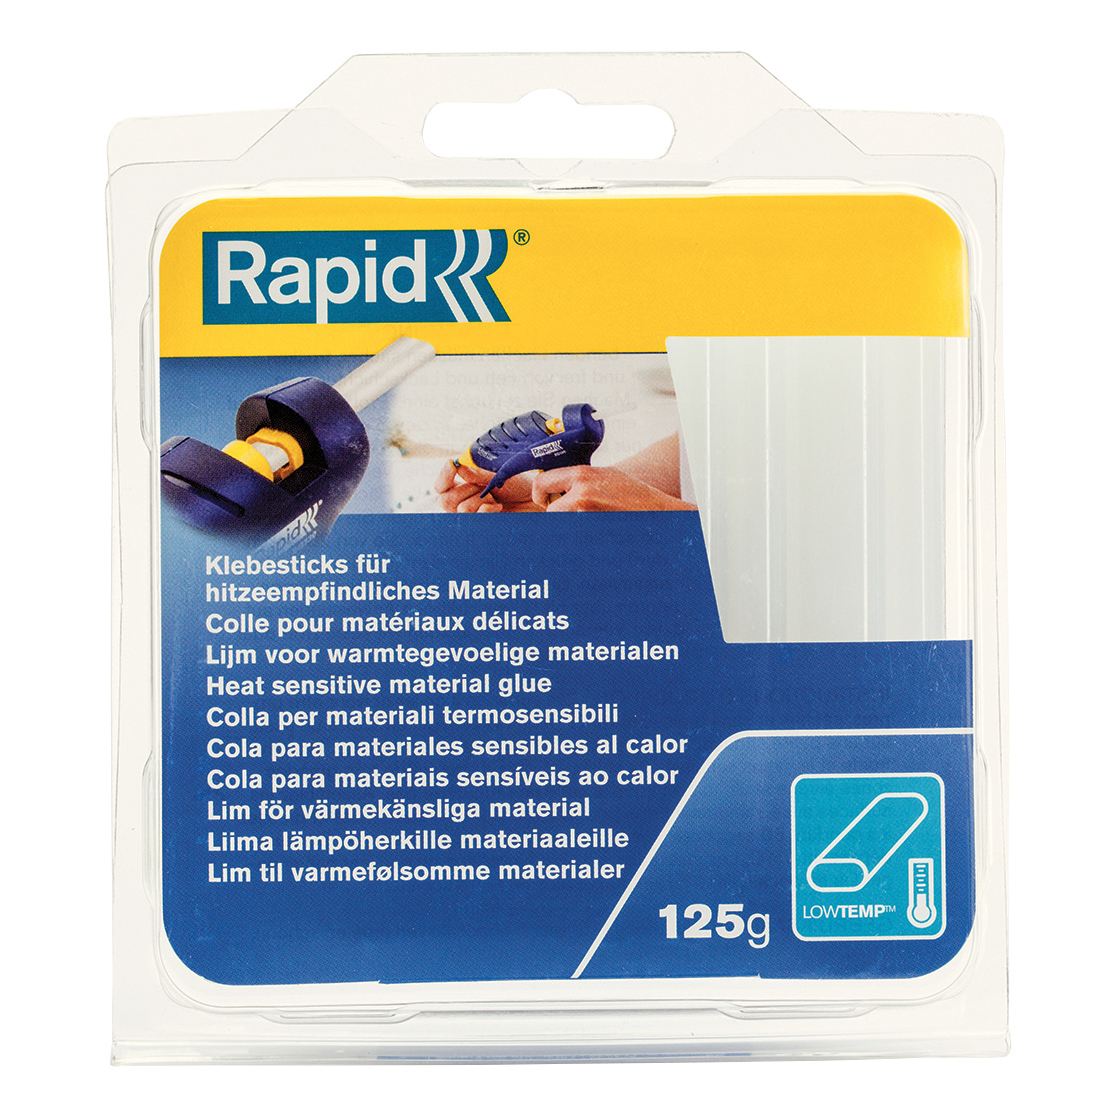 Rapid Glue Sticks Low Heat 125g Ref 40107349 Pack 14